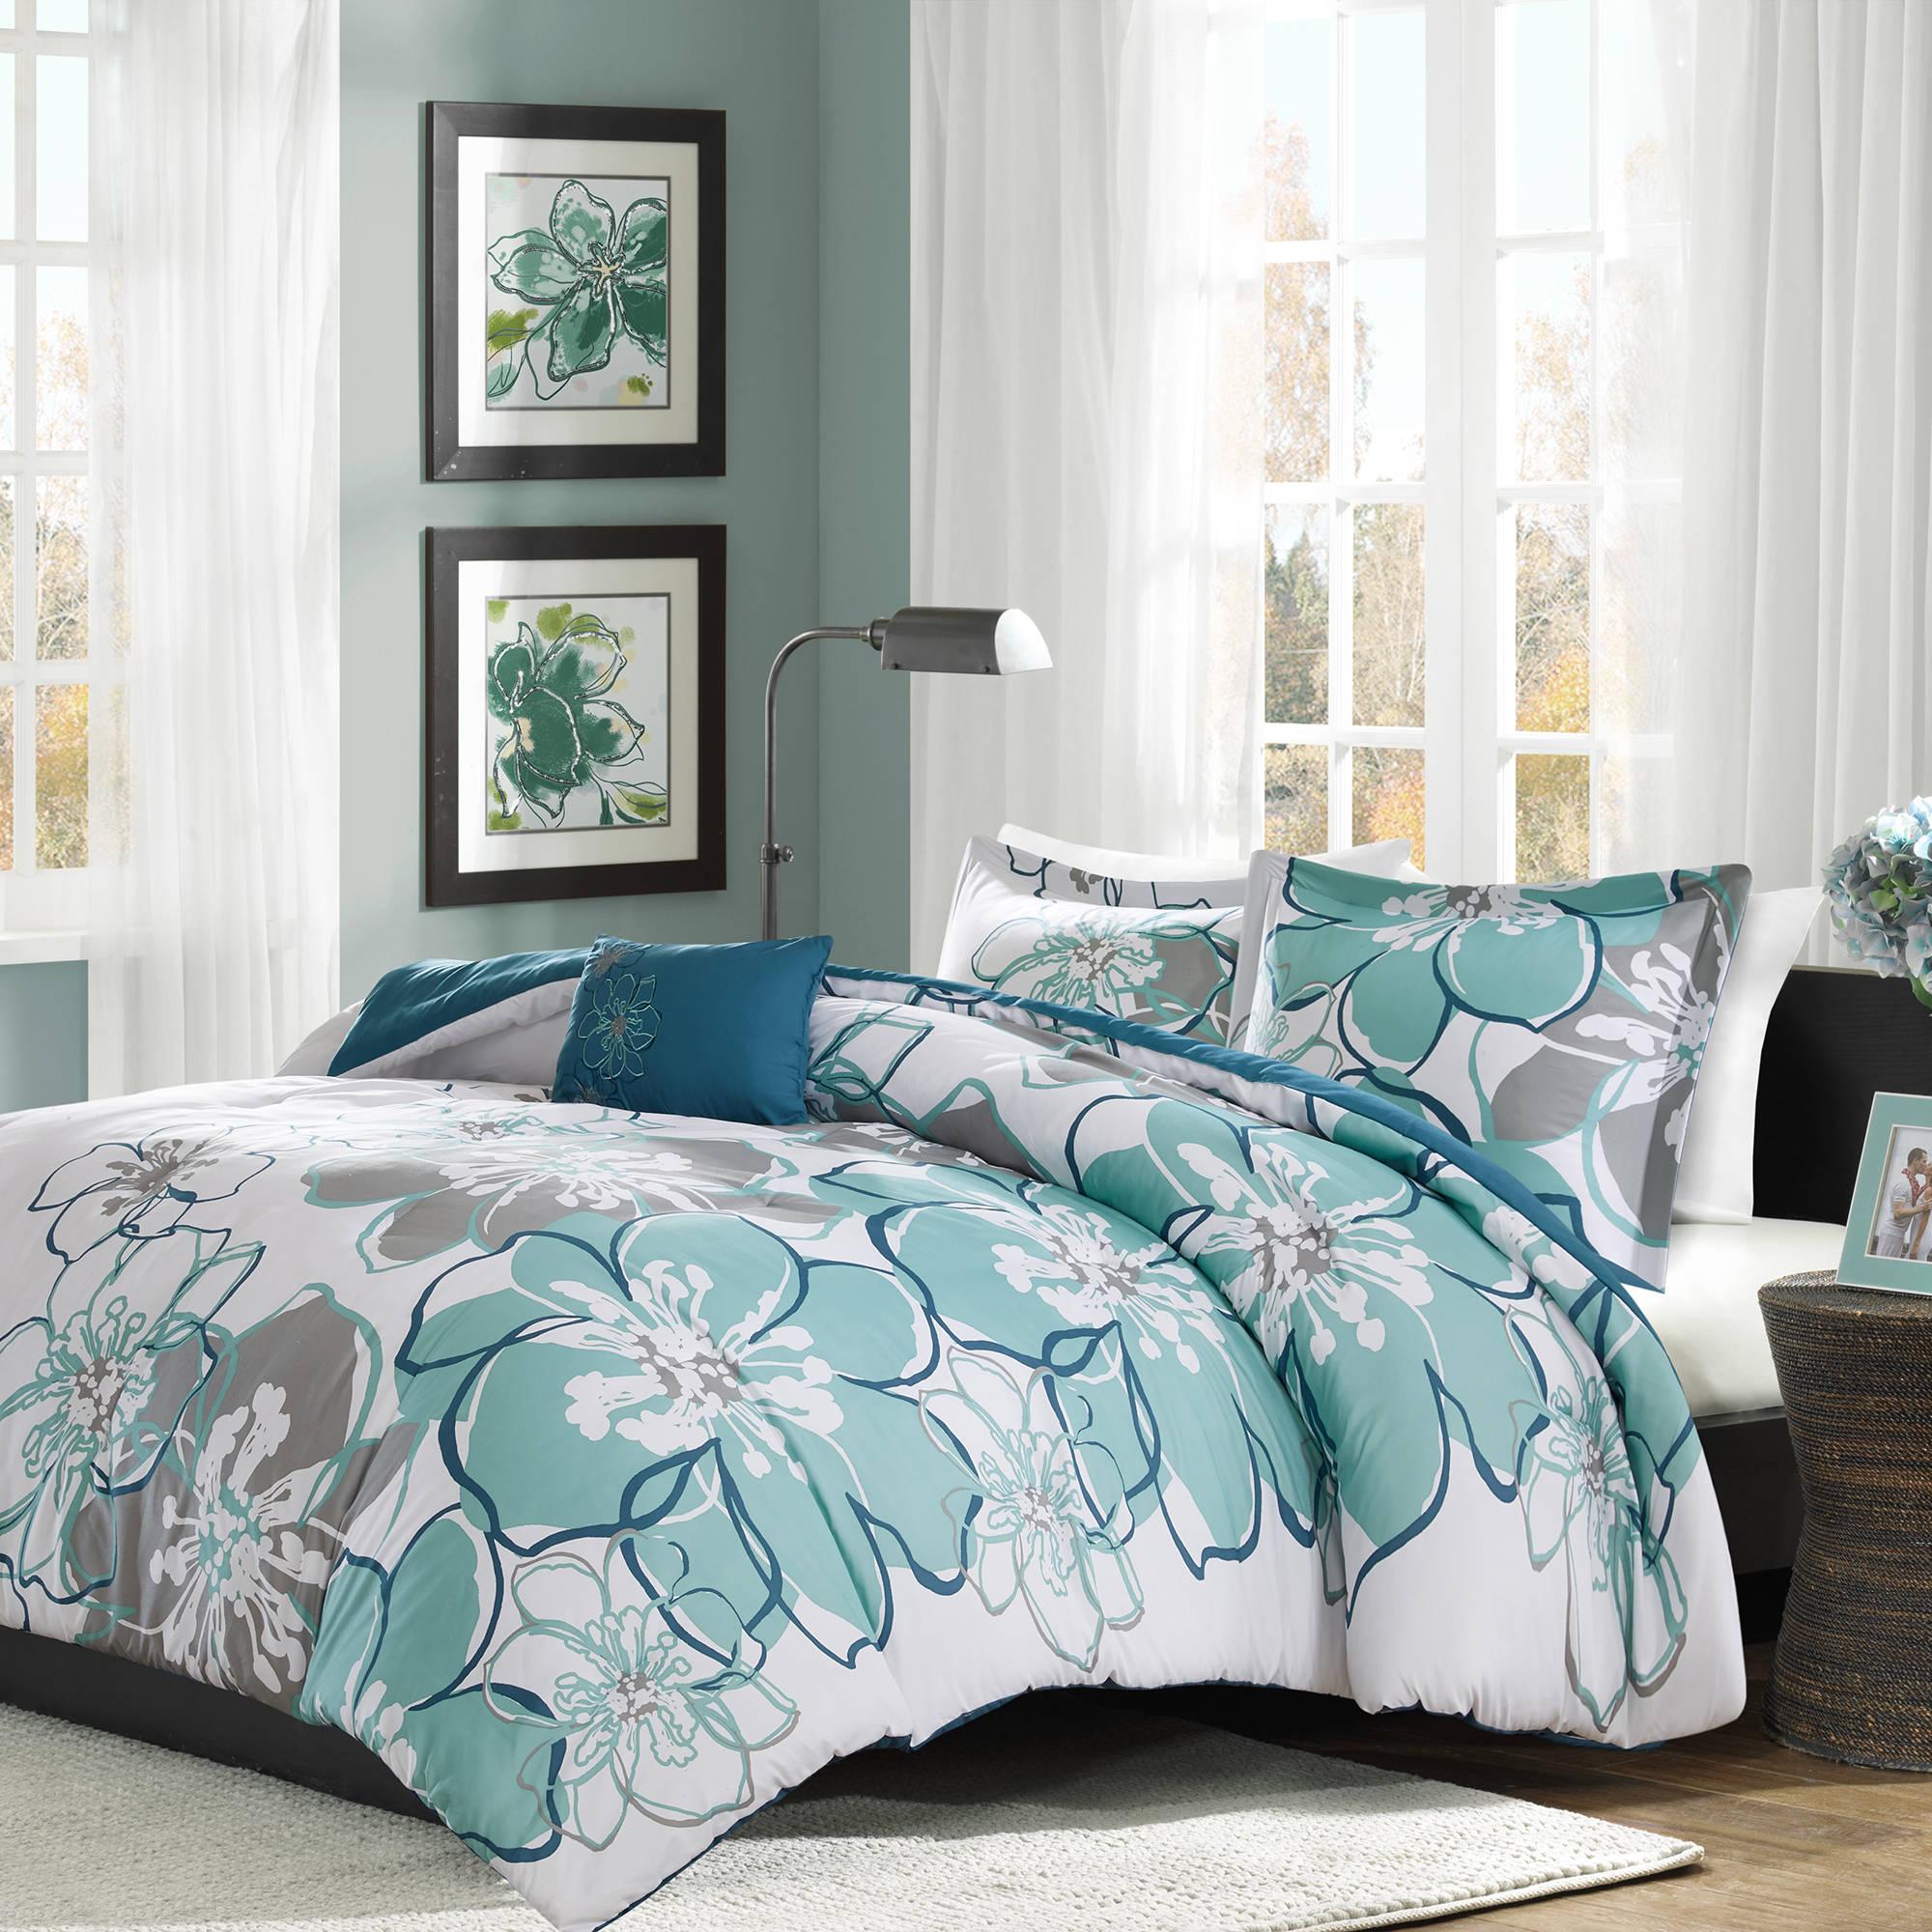 Home Essence Teen Kelly Printed Bedding Comforter Set by E & E CO LTD